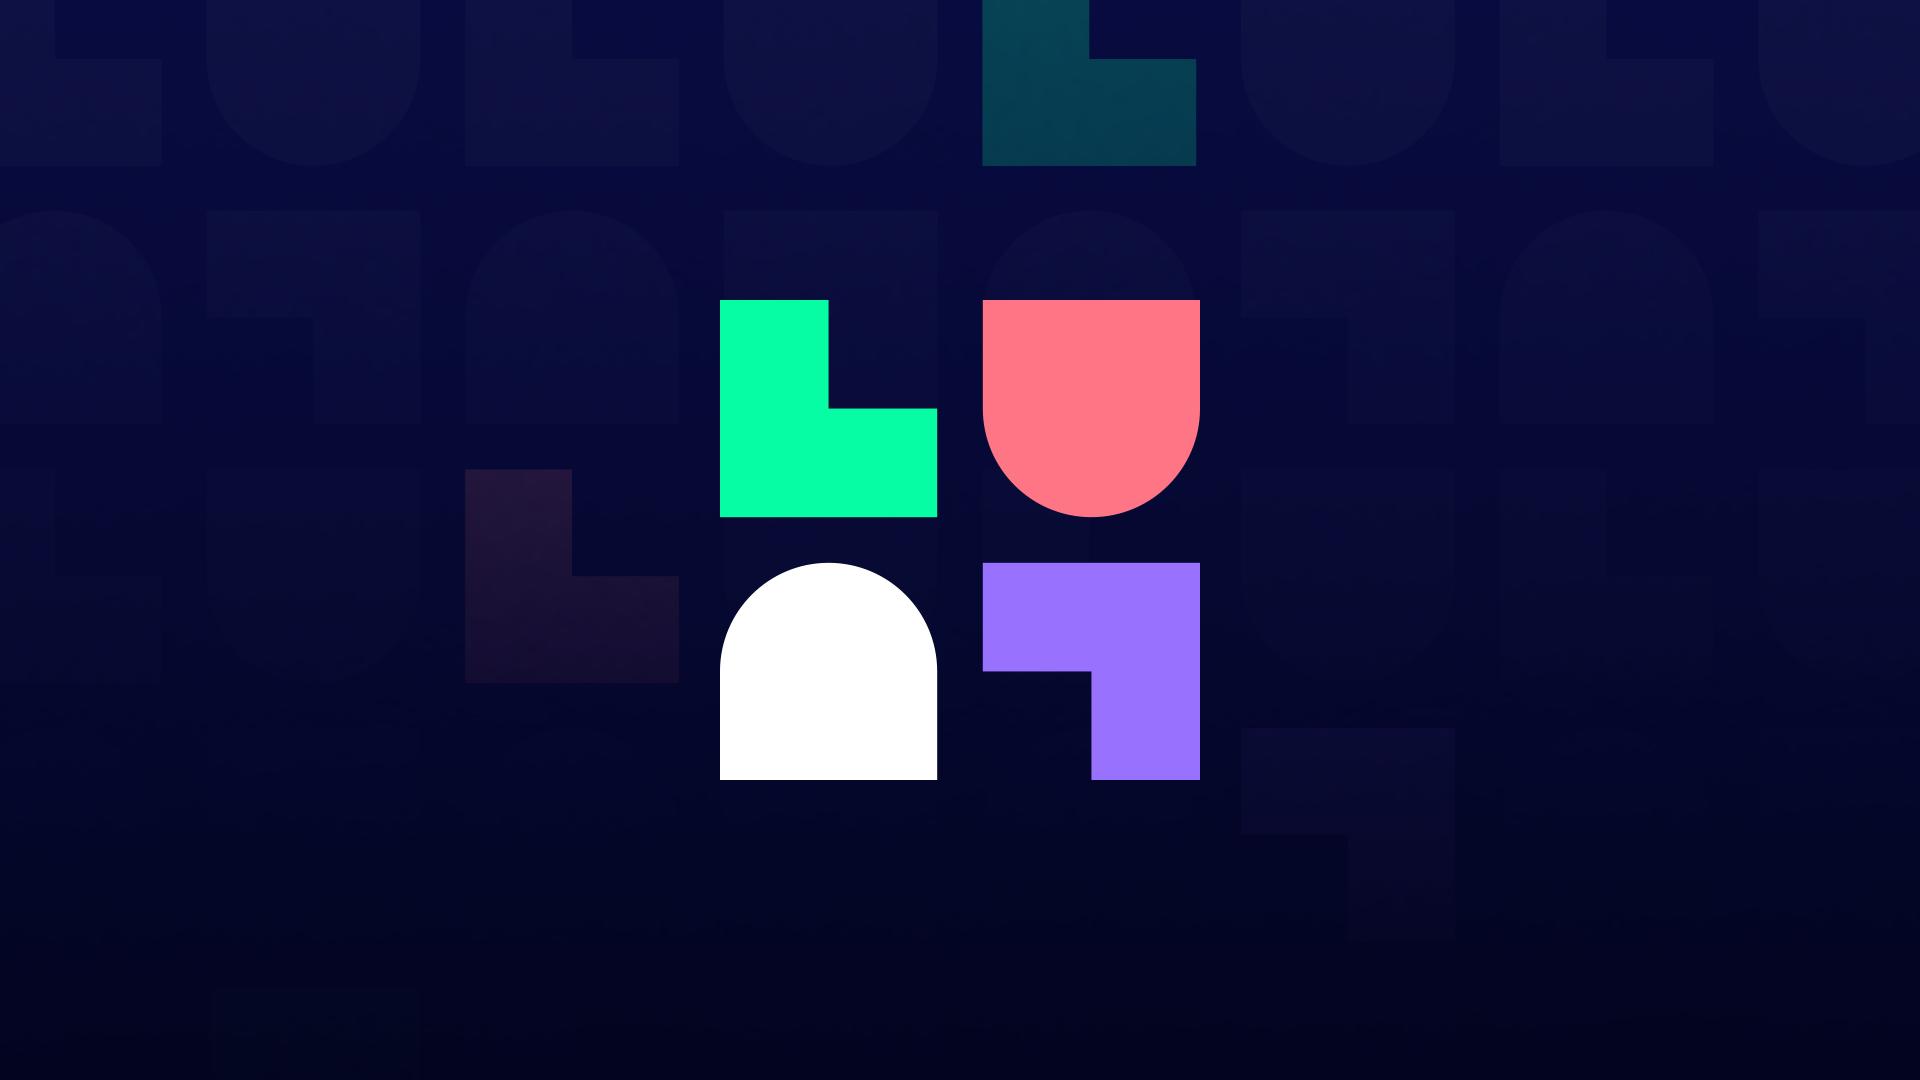 LuluLuvely logomark over navy blue patterned background